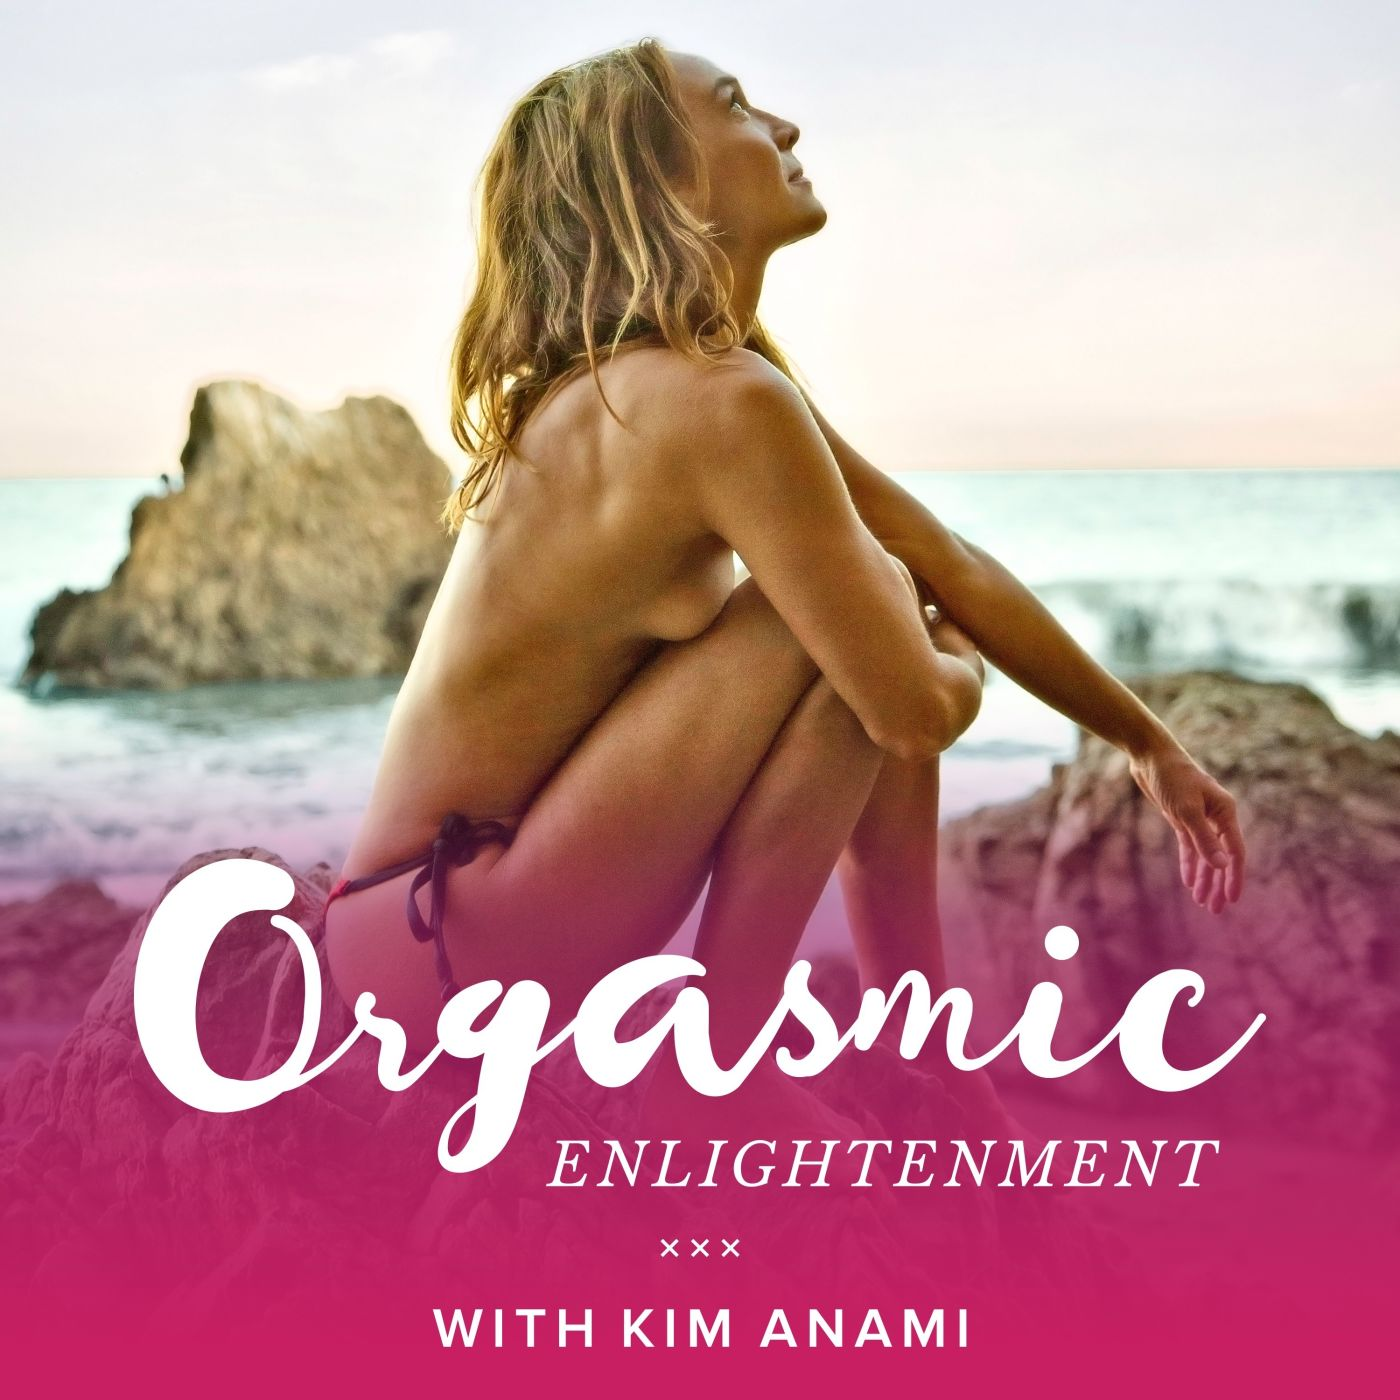 Orgasmic Enlightenment